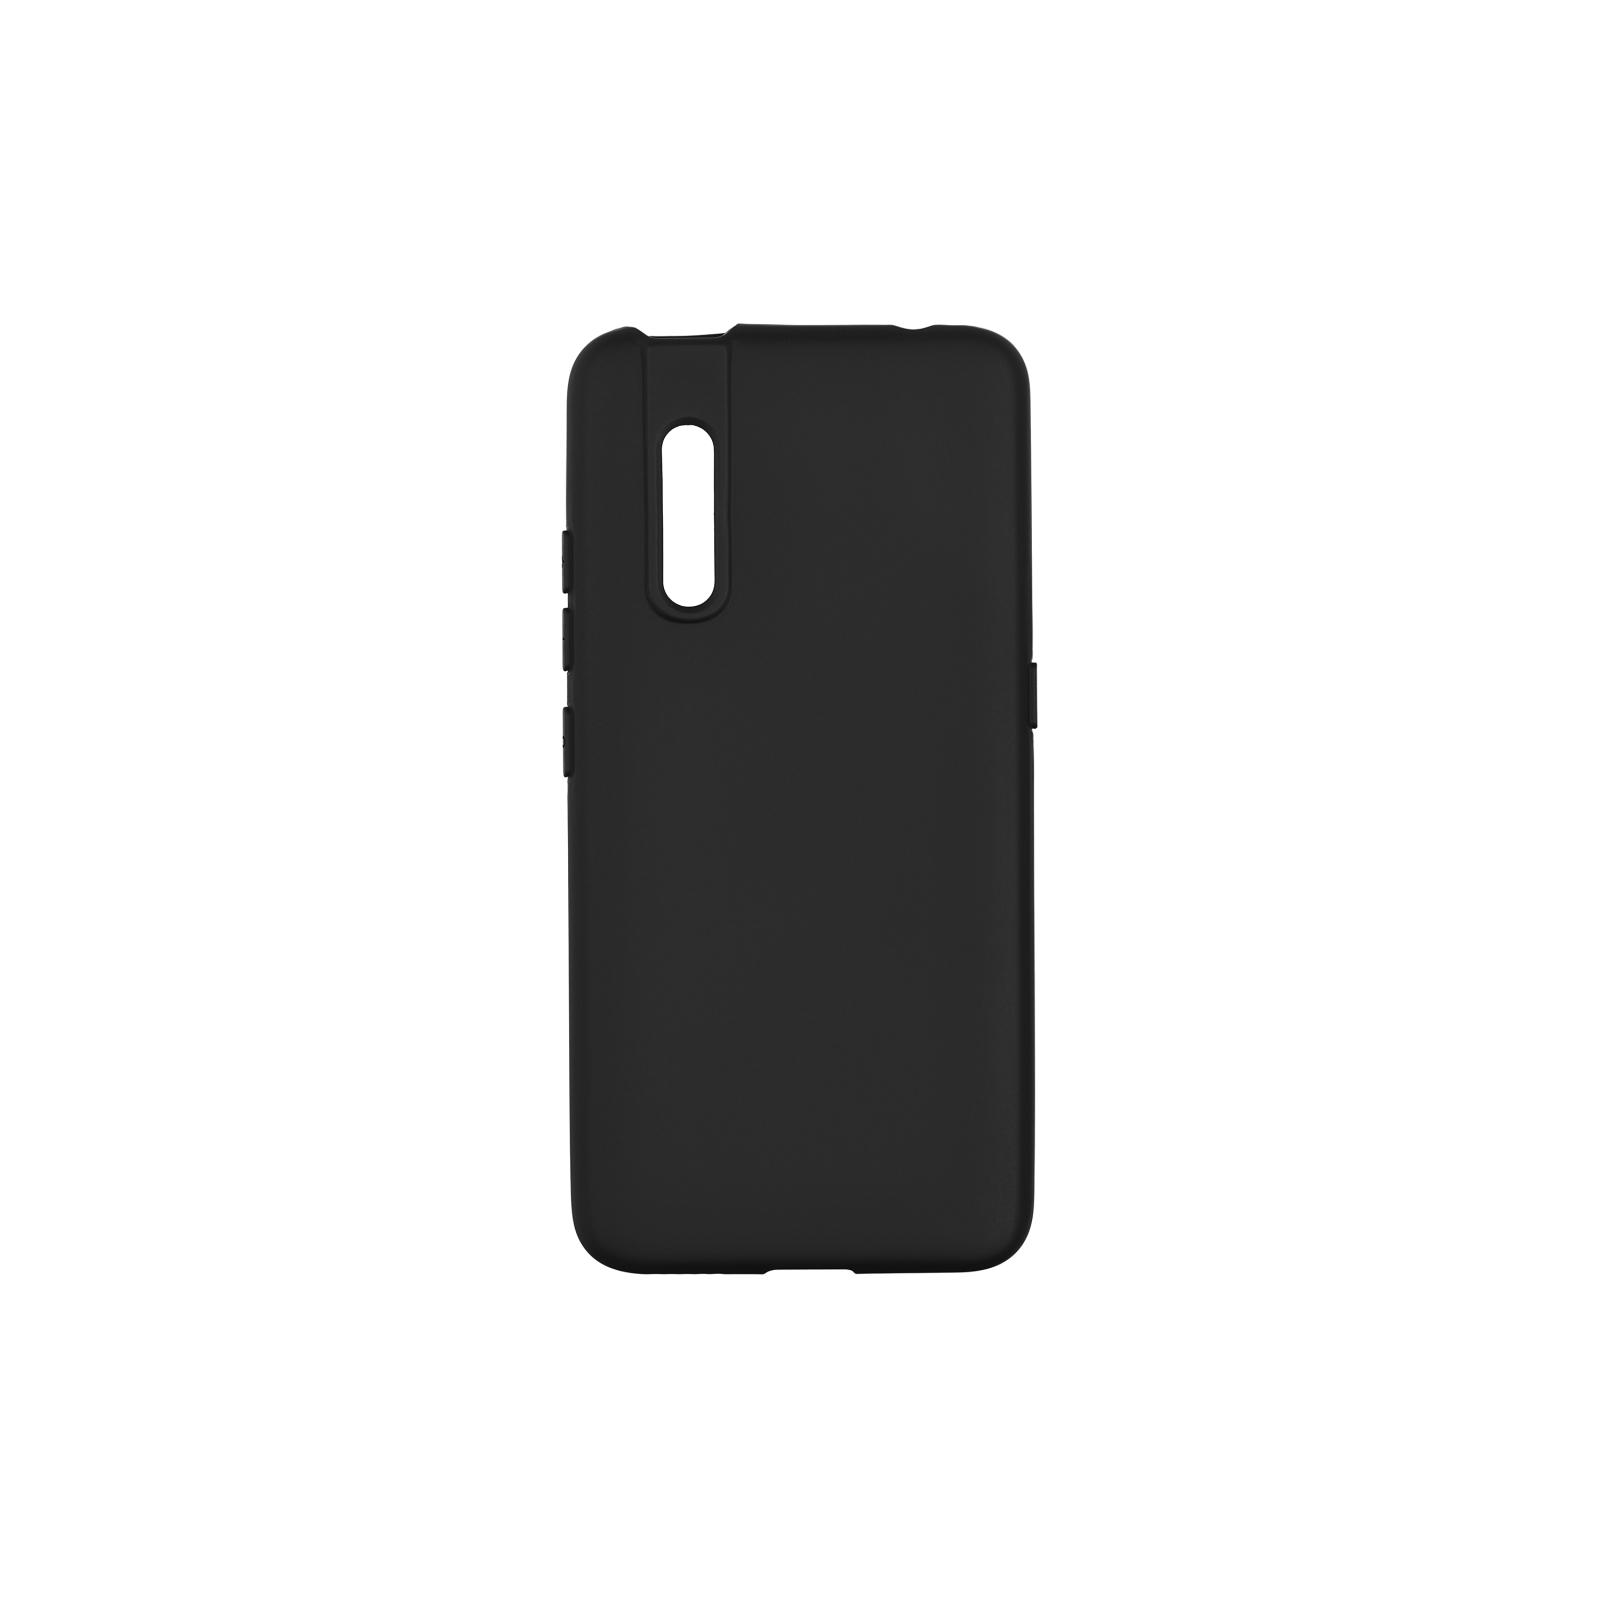 Чехол для моб. телефона 2E VIVO Y15/Y17, Hybrid, Transparent (2E-V-Y15-Y17-AOHB-TR)